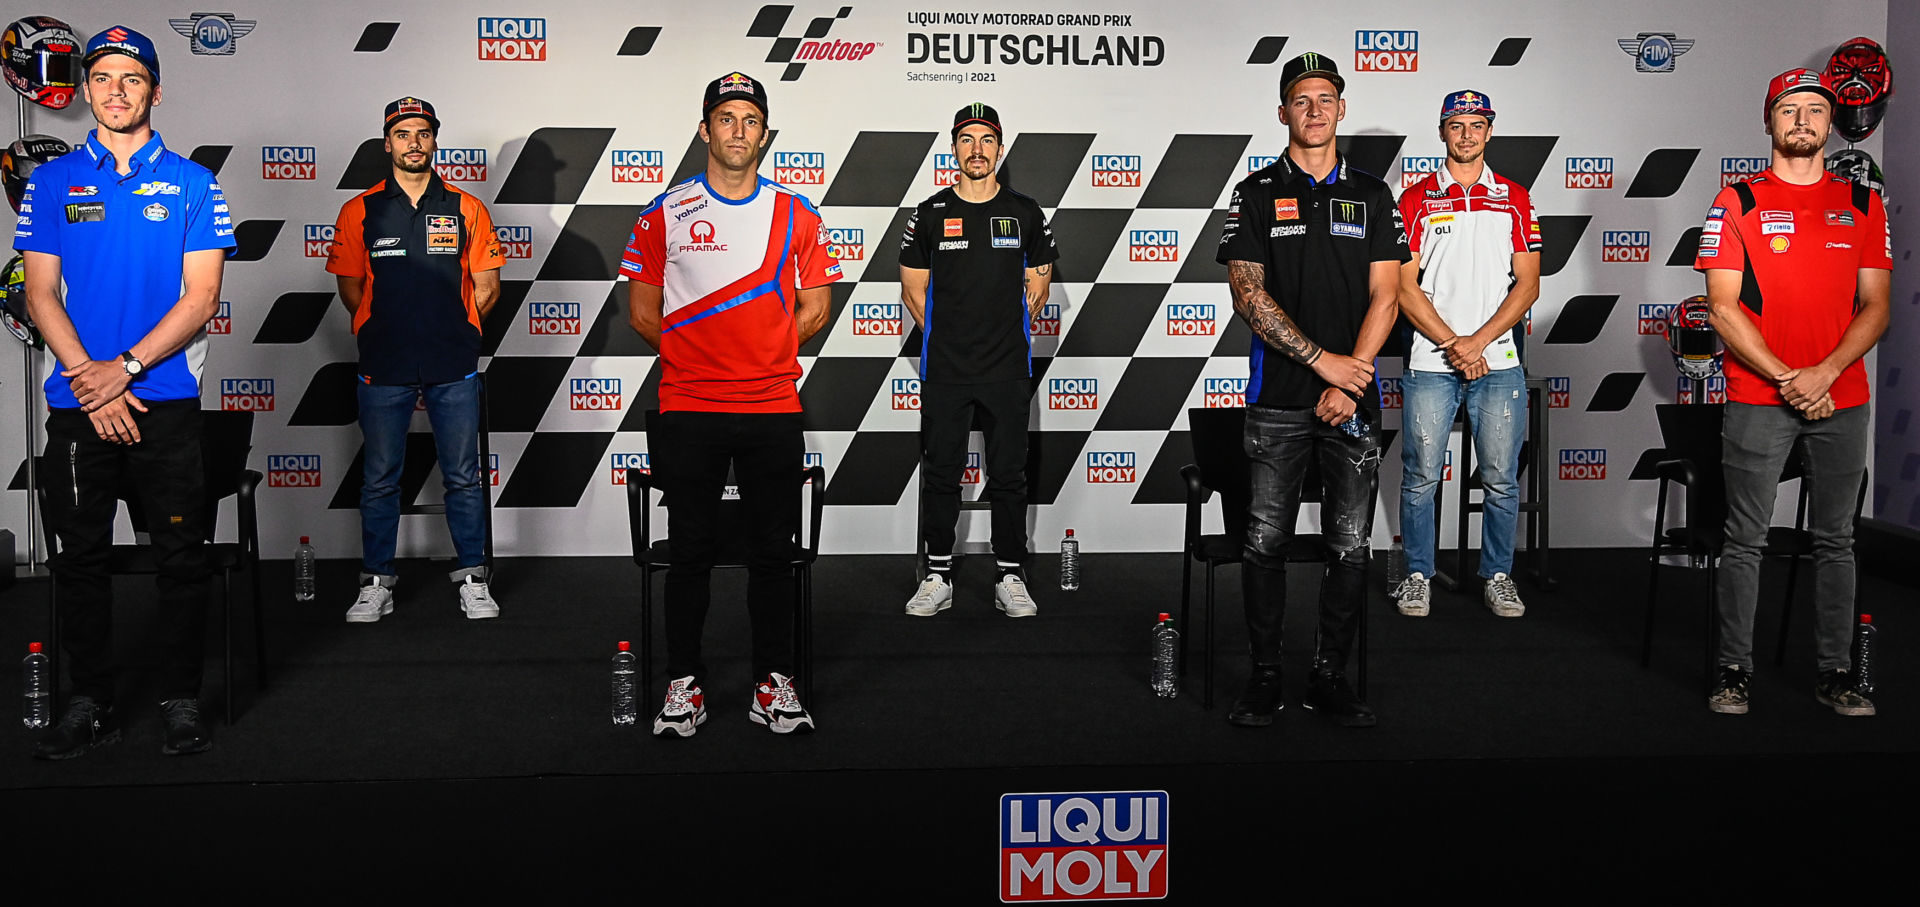 (From left) Joan Mir, Miguel Oliveira, Johann Zarco, Maverick Viñales, Fabio Quartararo, Fabio Di Giannantonio and Jack Miller. Photo courtesy Dorna.